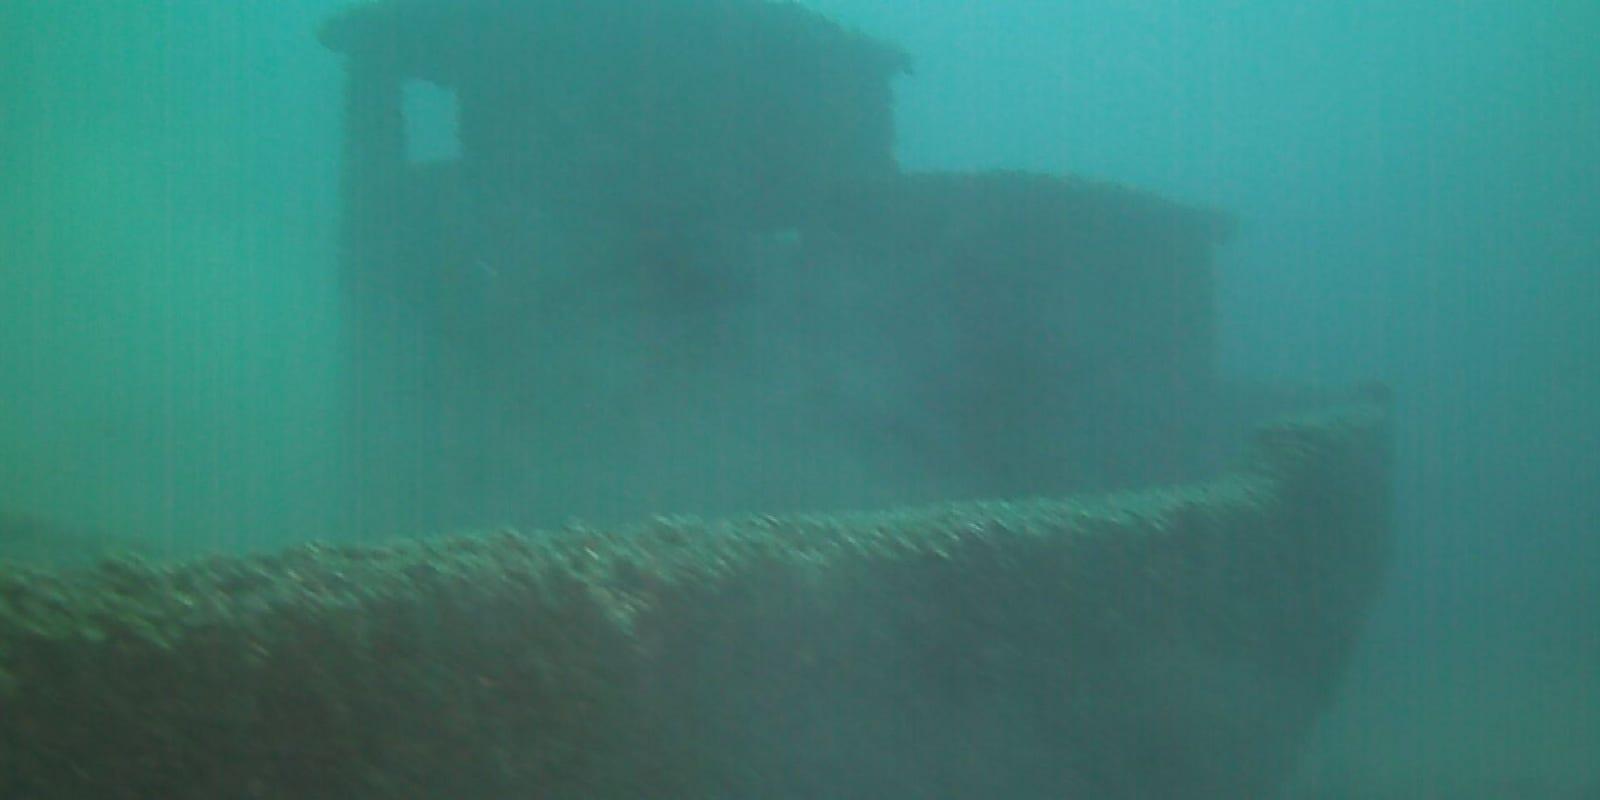 Treasure hunters find undiscovered shipwreck in Lake Michigan